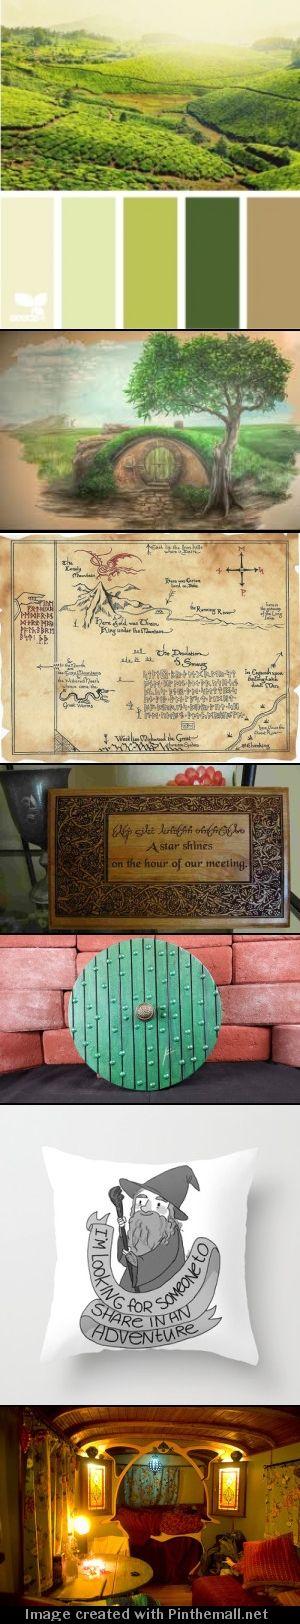 1000 ideas about nerd bedroom on pinterest cute room for Hobbit themed bedroom